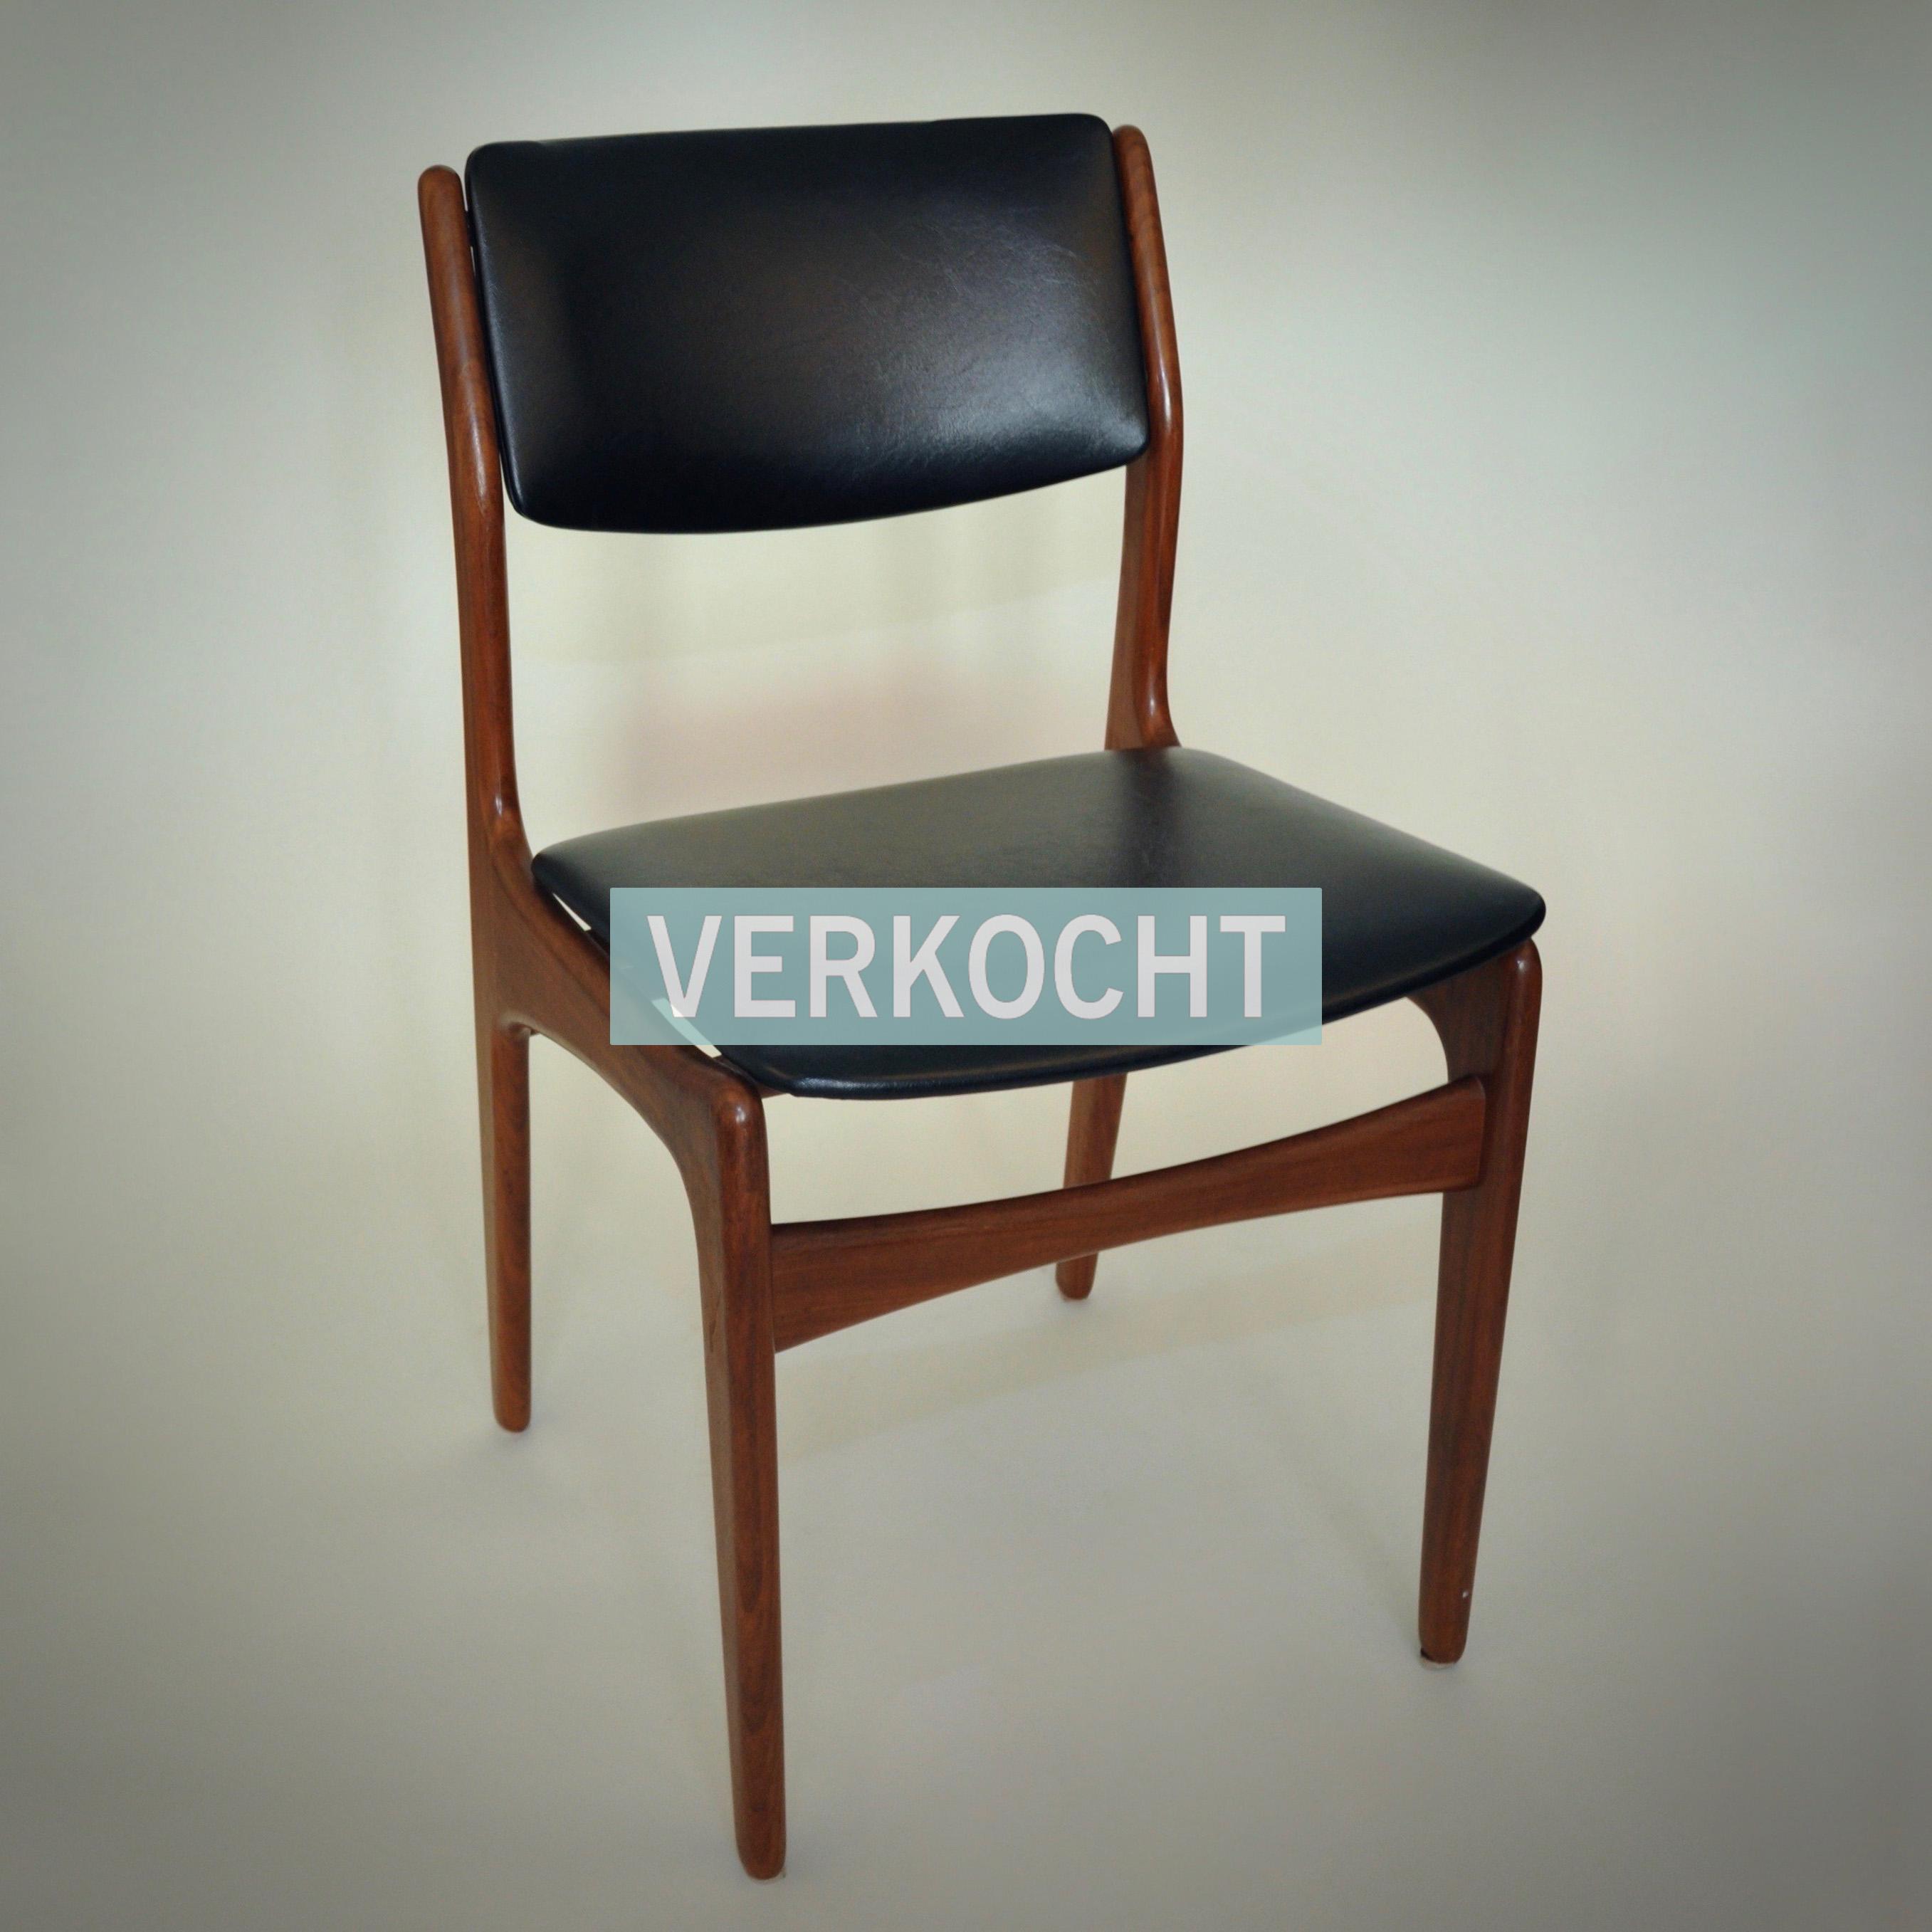 Webe vintage design ketsch vintage check onze webhsop for Dutch design eetkamerstoelen